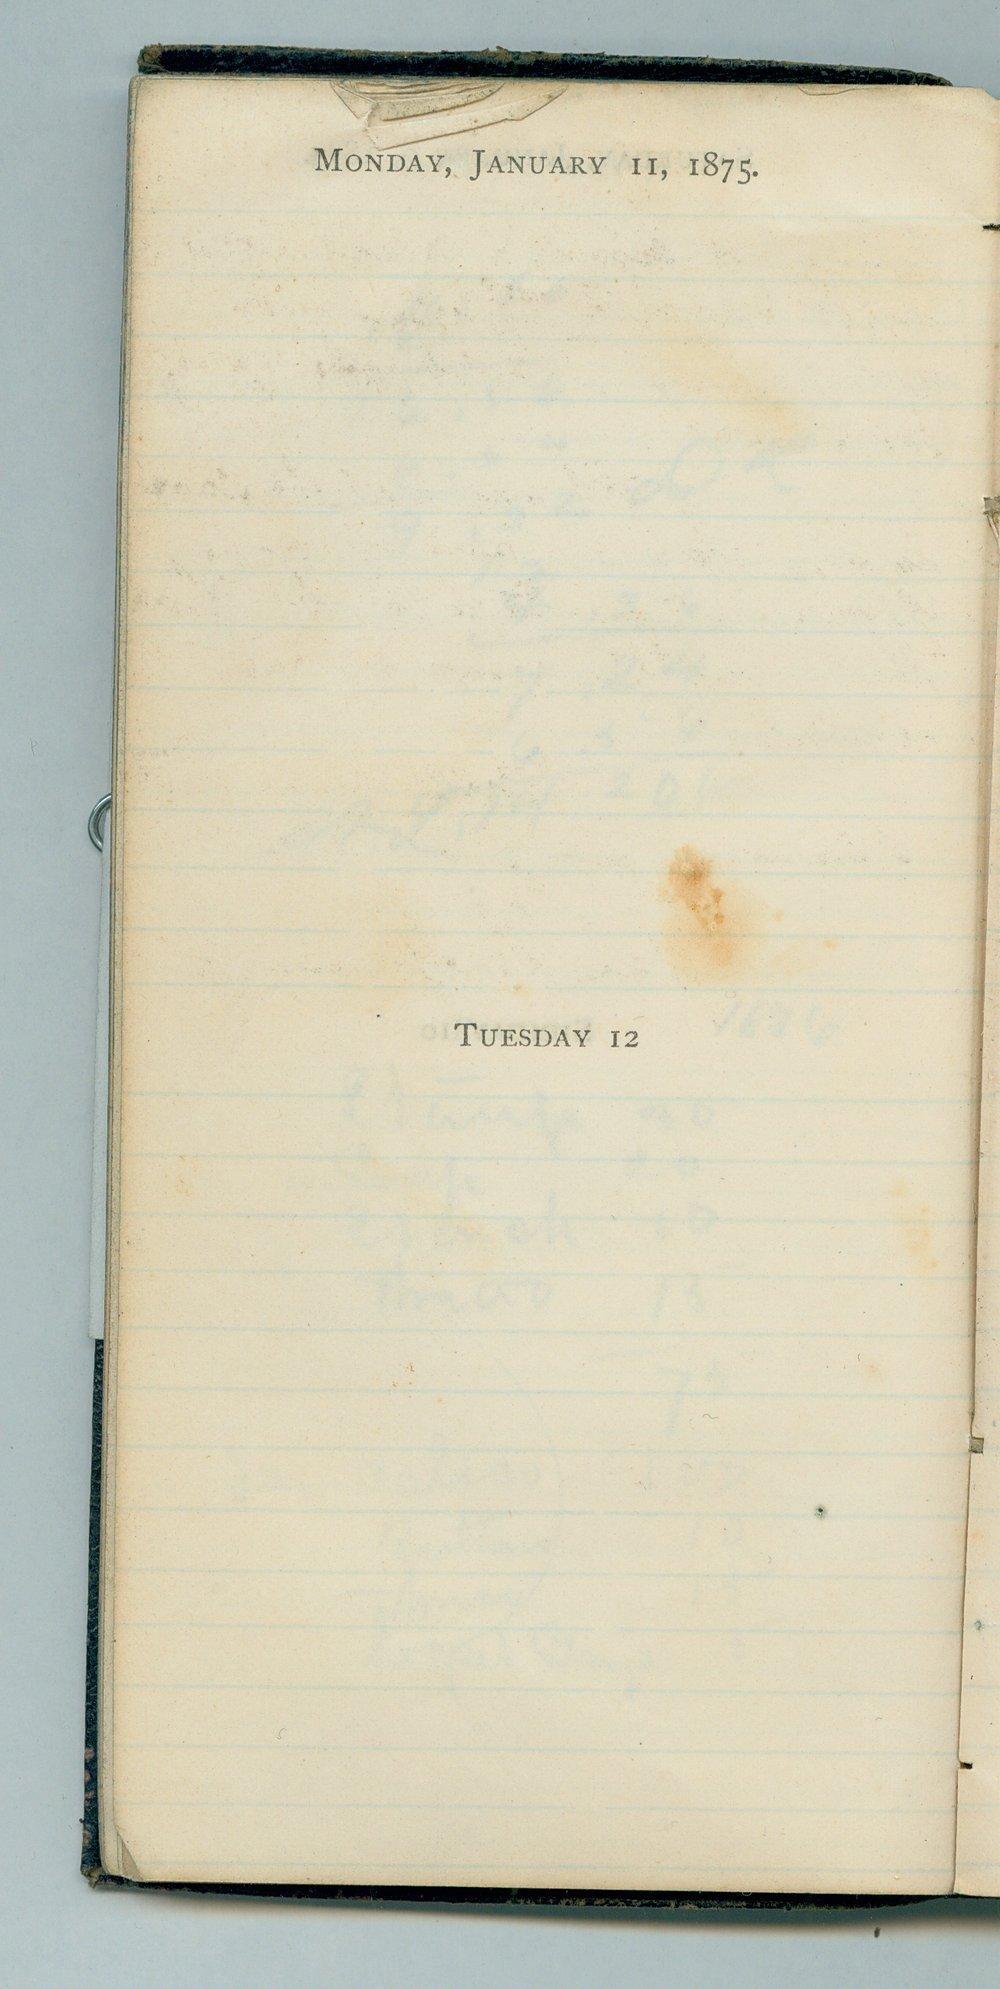 John William Gardiner diary - Jan 11, 1875